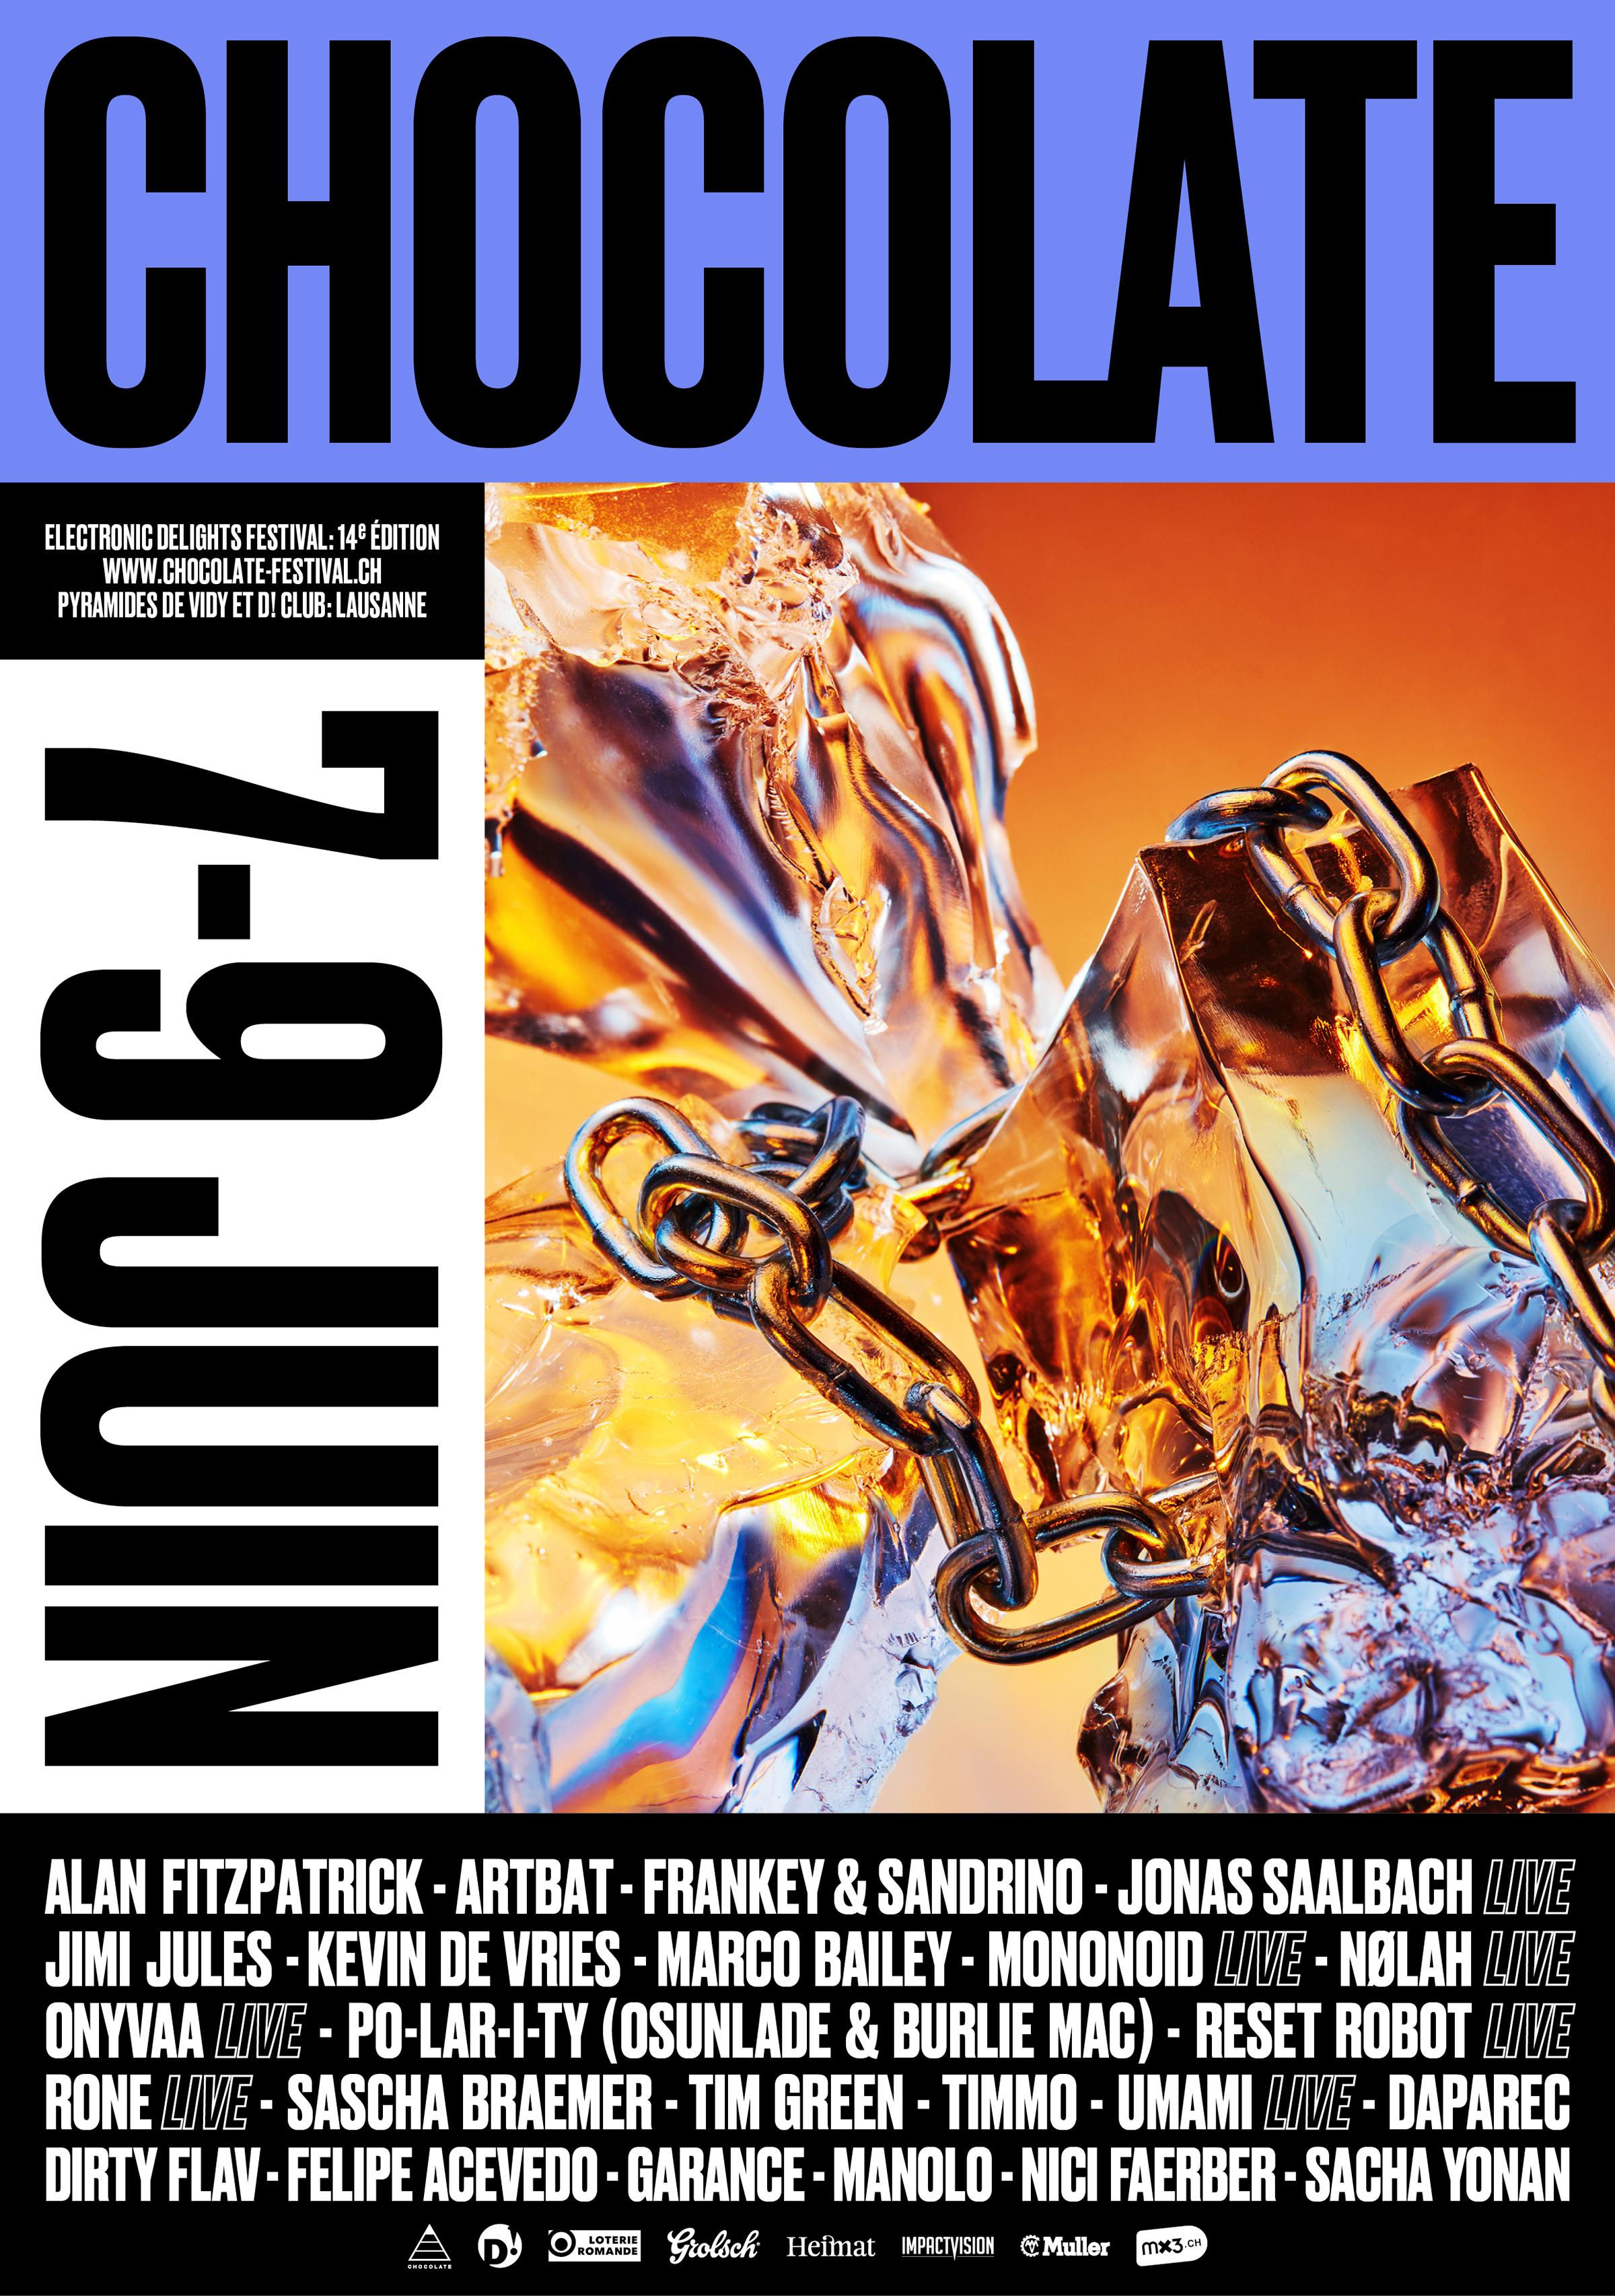 Chocolate-2019.jpg